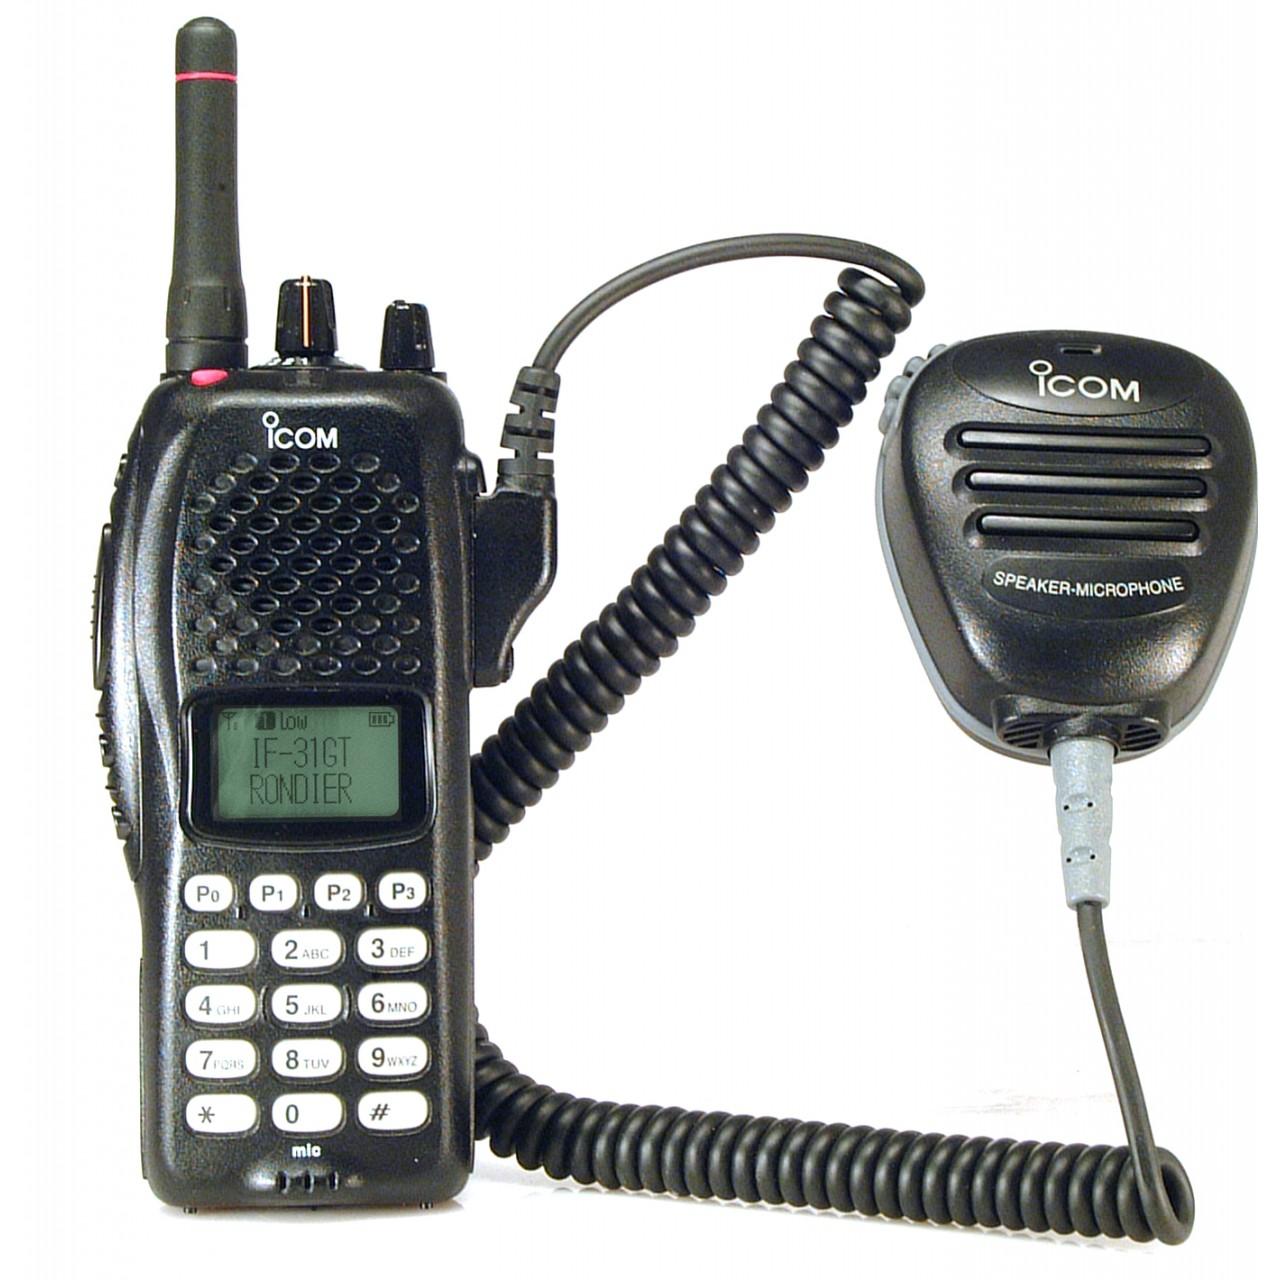 HM-138ROMIF31 Microphones - ICOM